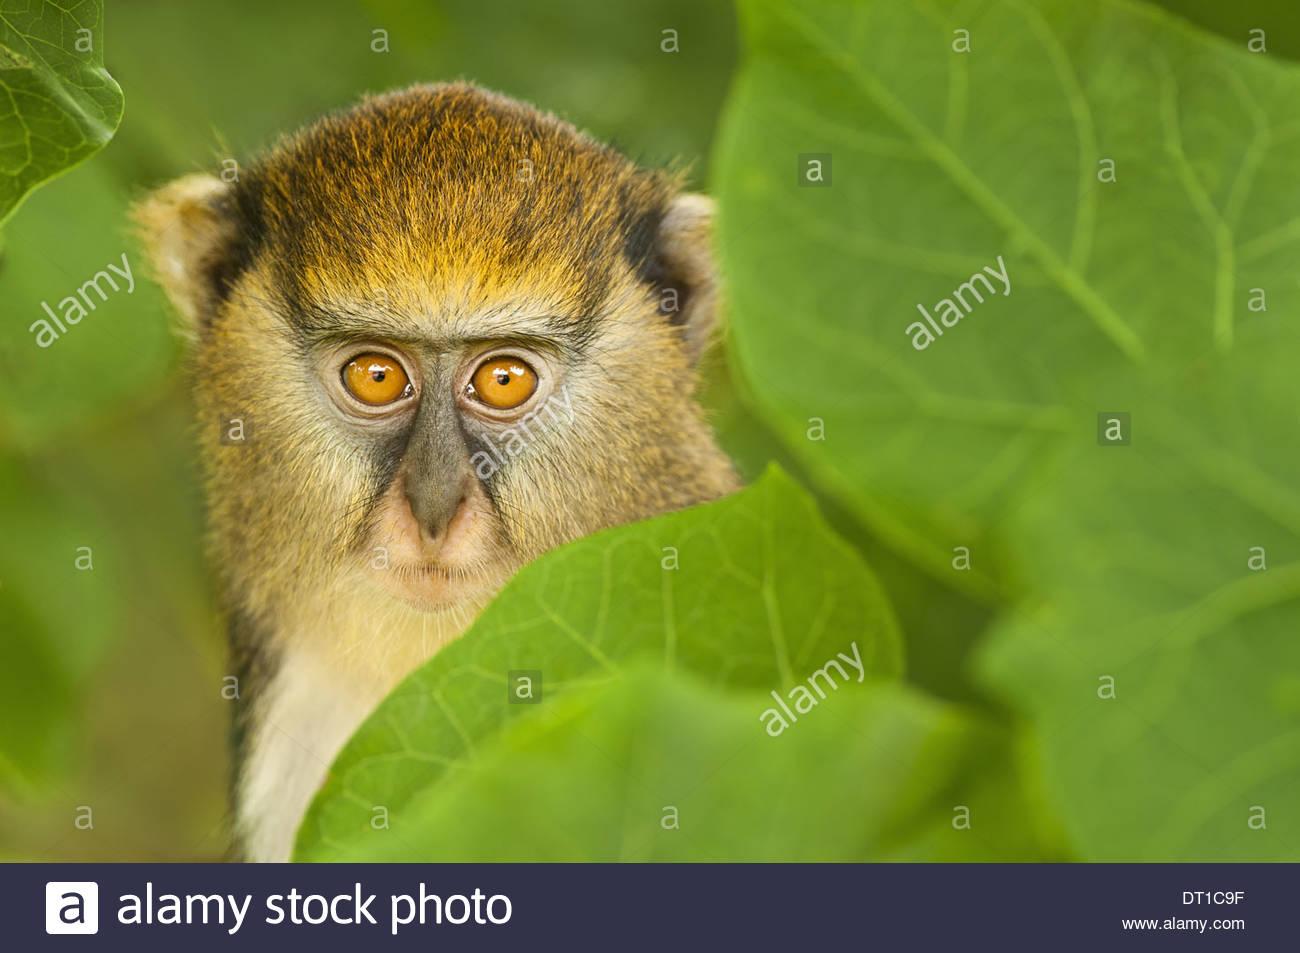 Boabeng-Fiema Monkey Sanctuary Ghana young Mona monkey Cercopithecus mona Ghana - Stock Image